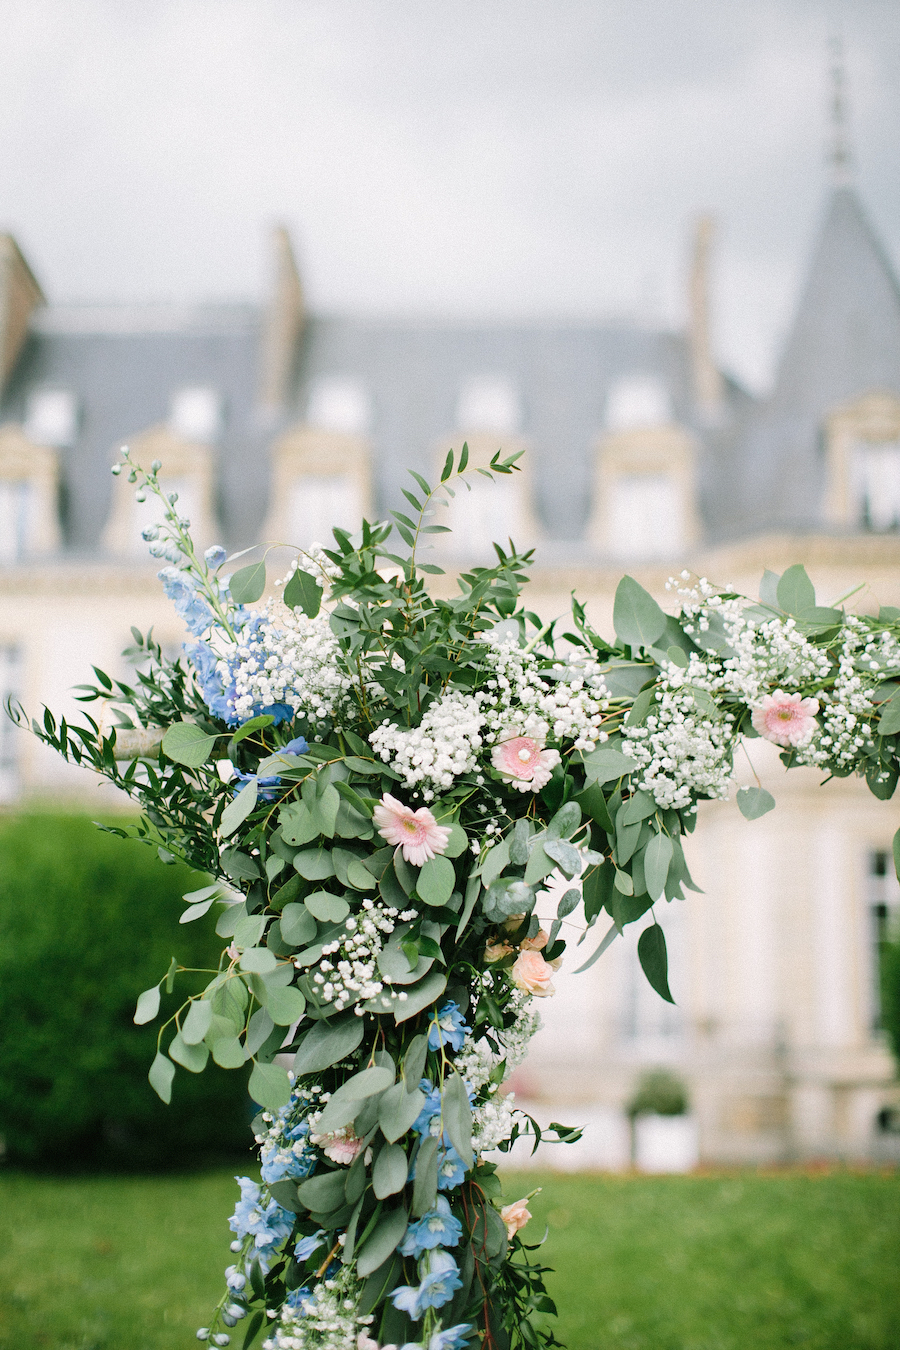 saya-photography-chateau-santeny-23.jpg